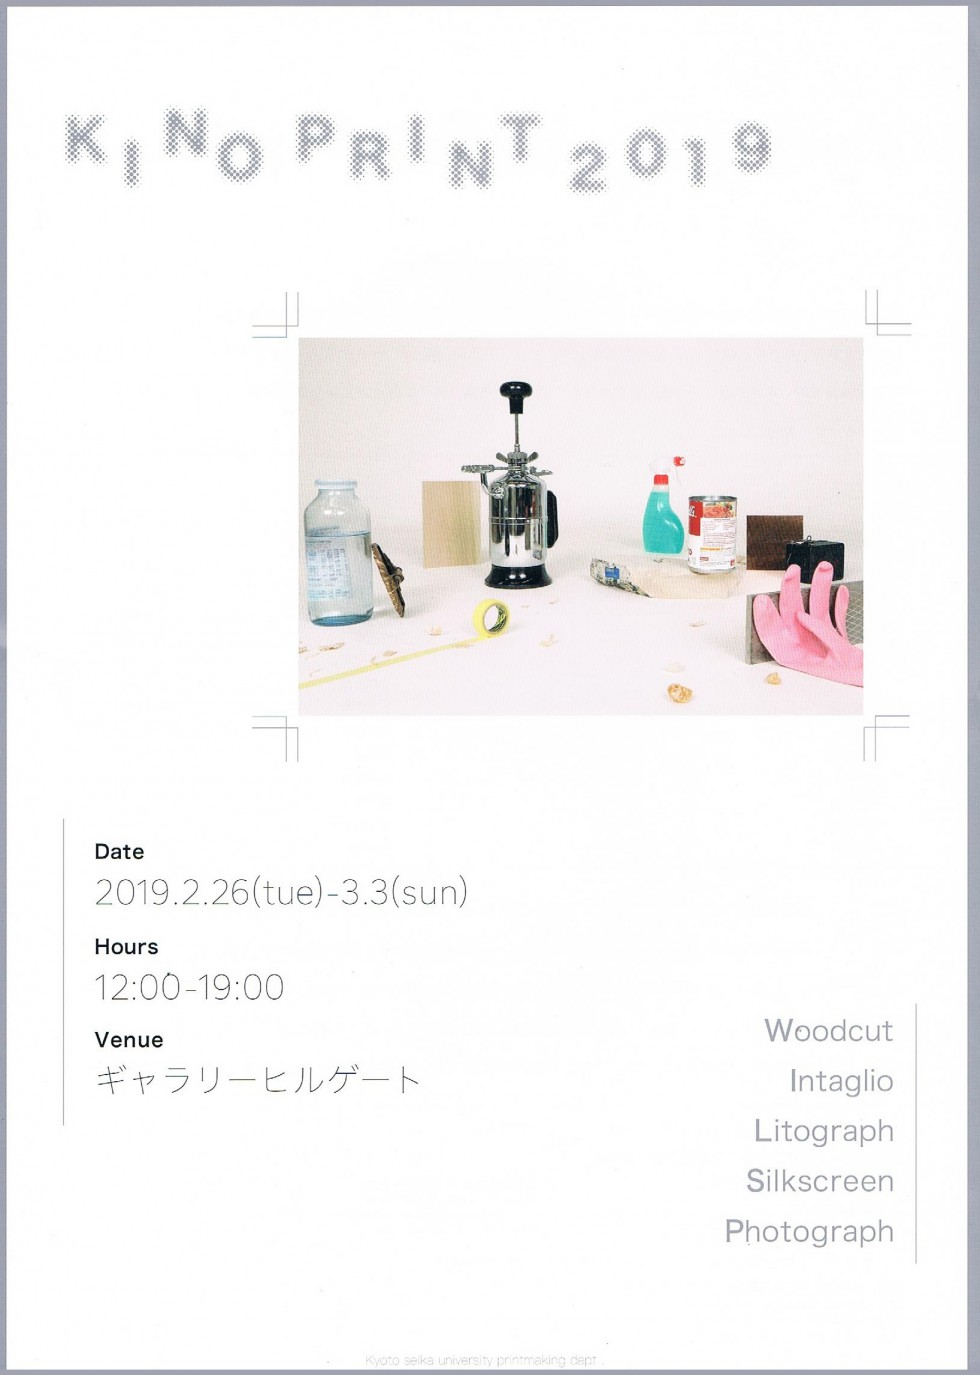 KINO PRINT 2019 京都精華大学 版画コース 4回生・大学院生・教員による版画集出版記念展